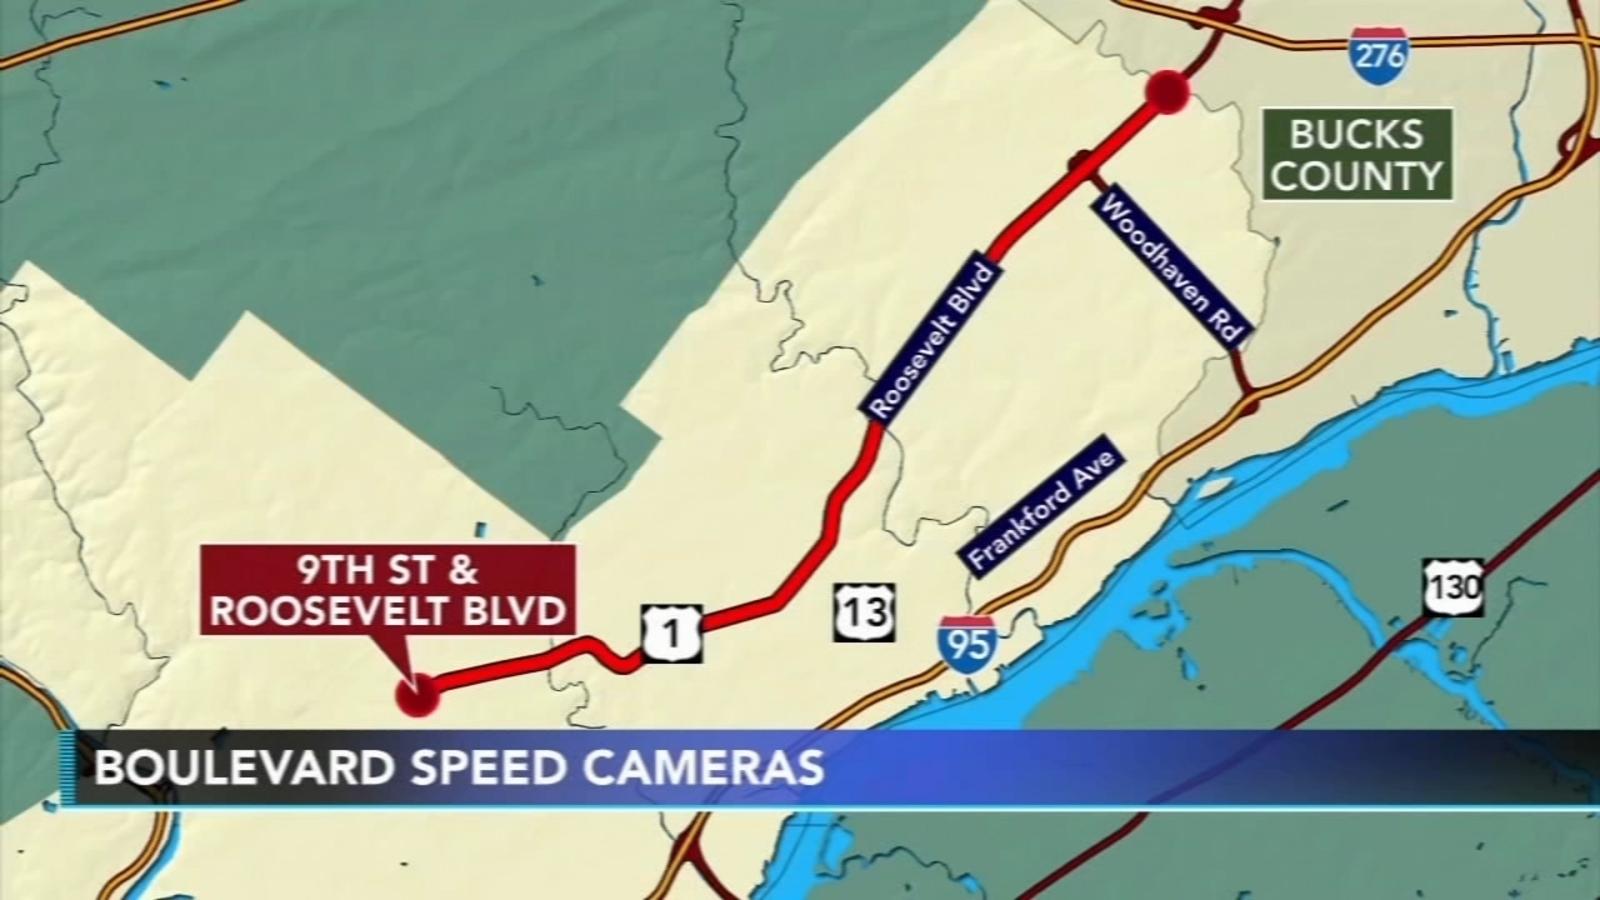 Mayor Kenny signs Roosevelt Boulevard speed cameras Legislation into Law